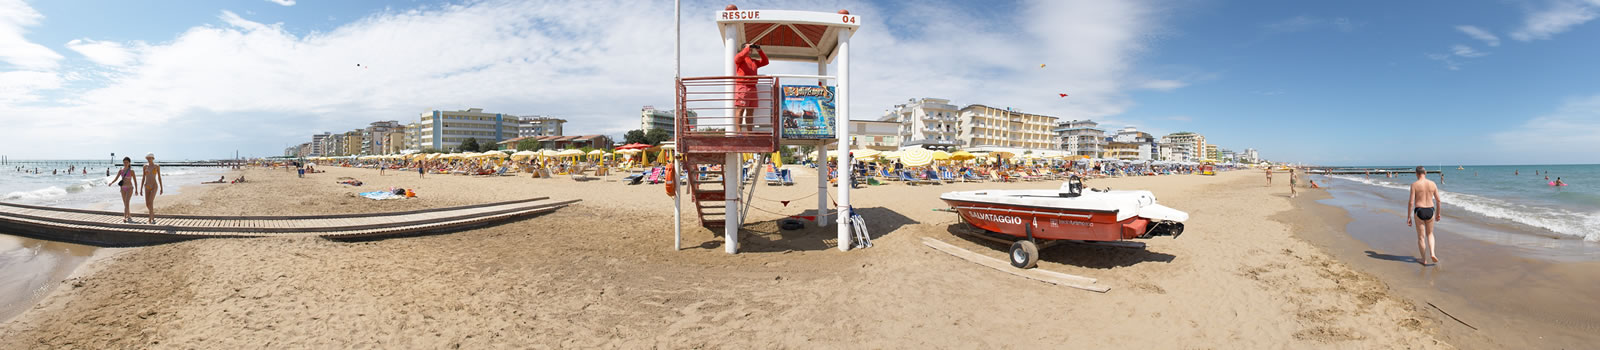 spiaggia-testata_0